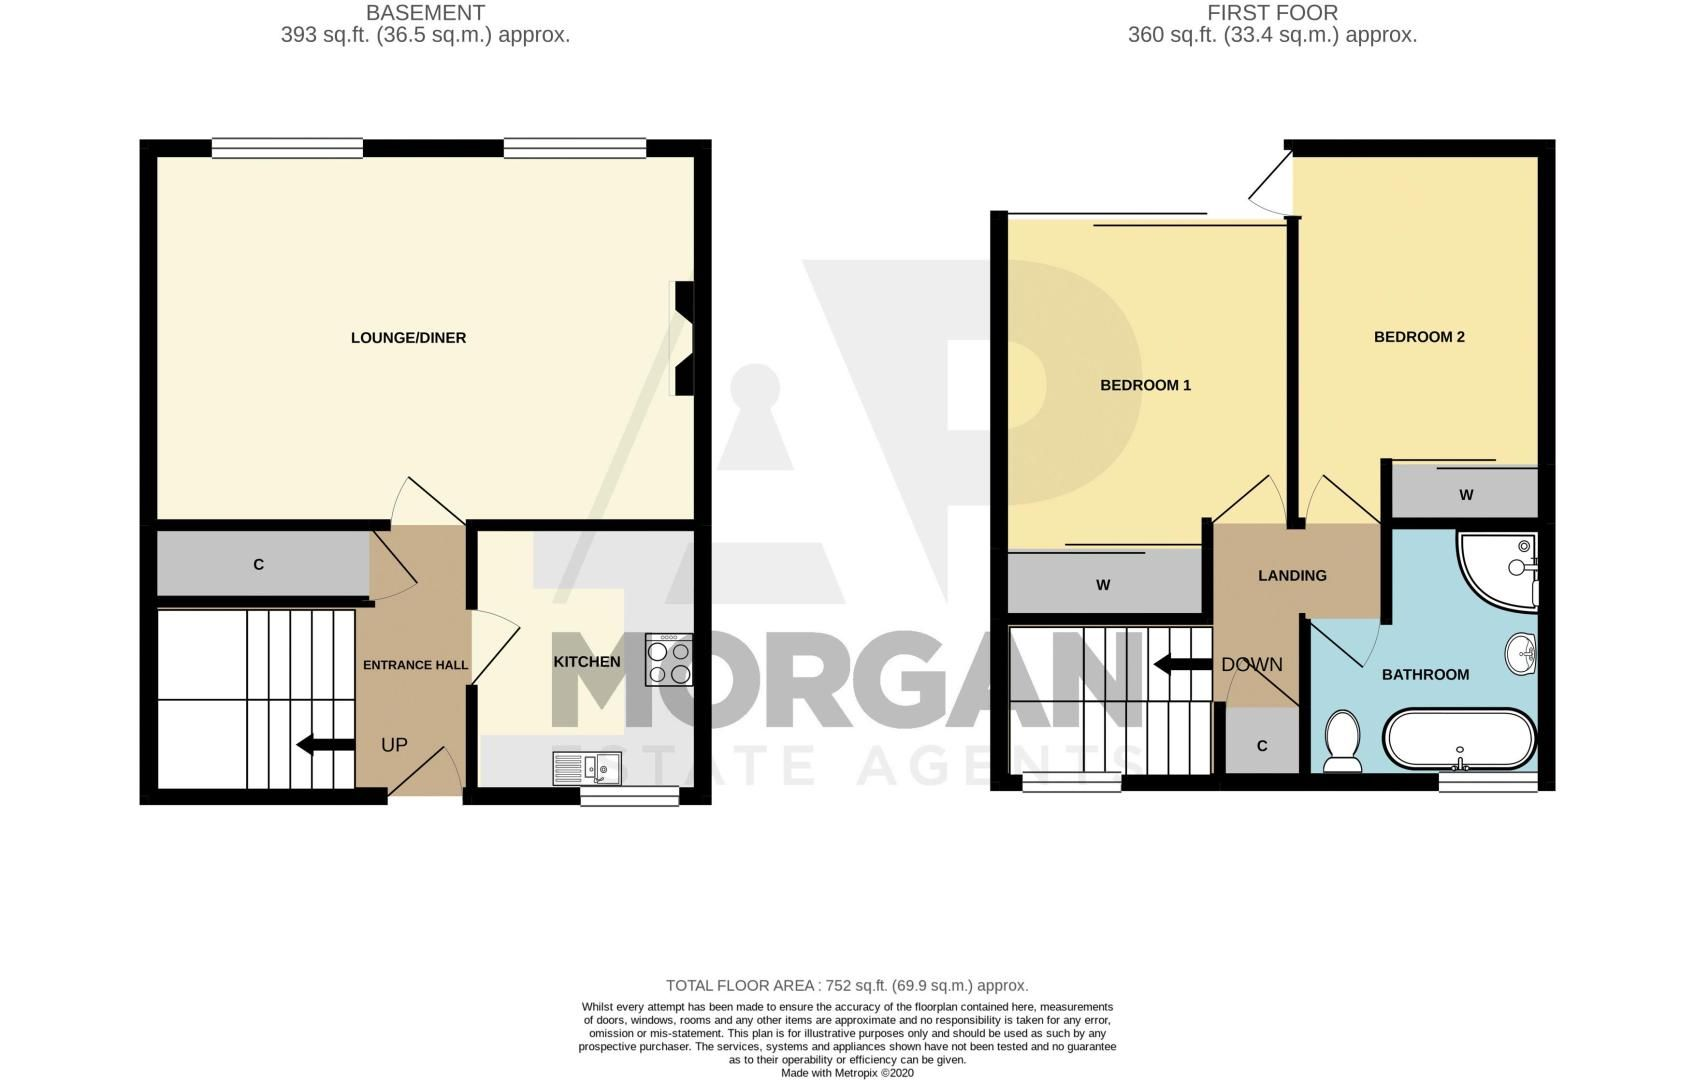 2 bed  for sale in Bundle Hill - Property Floorplan